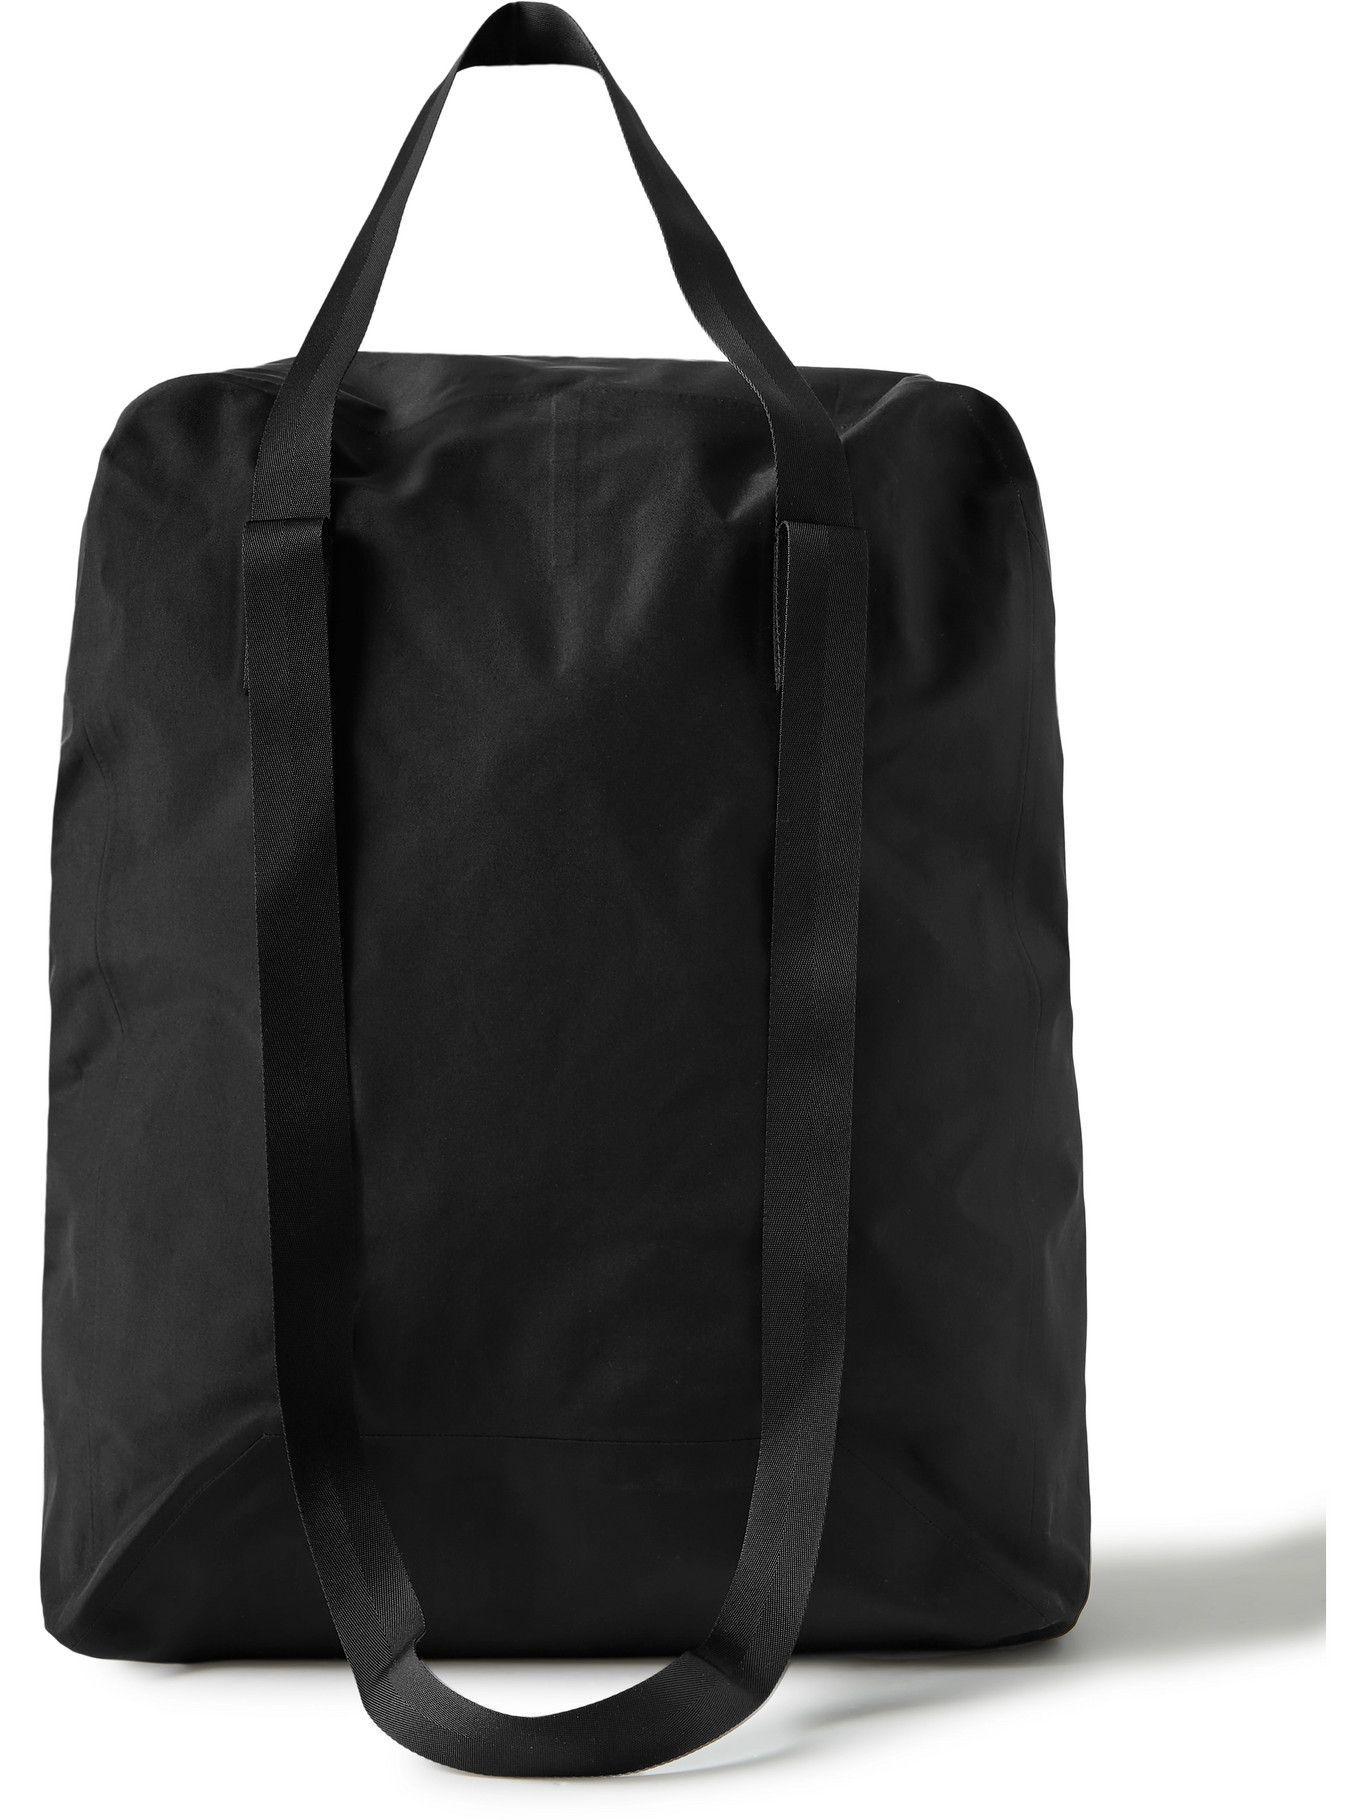 Photo: Veilance - Seque Waterproof Nylon Tote Bag